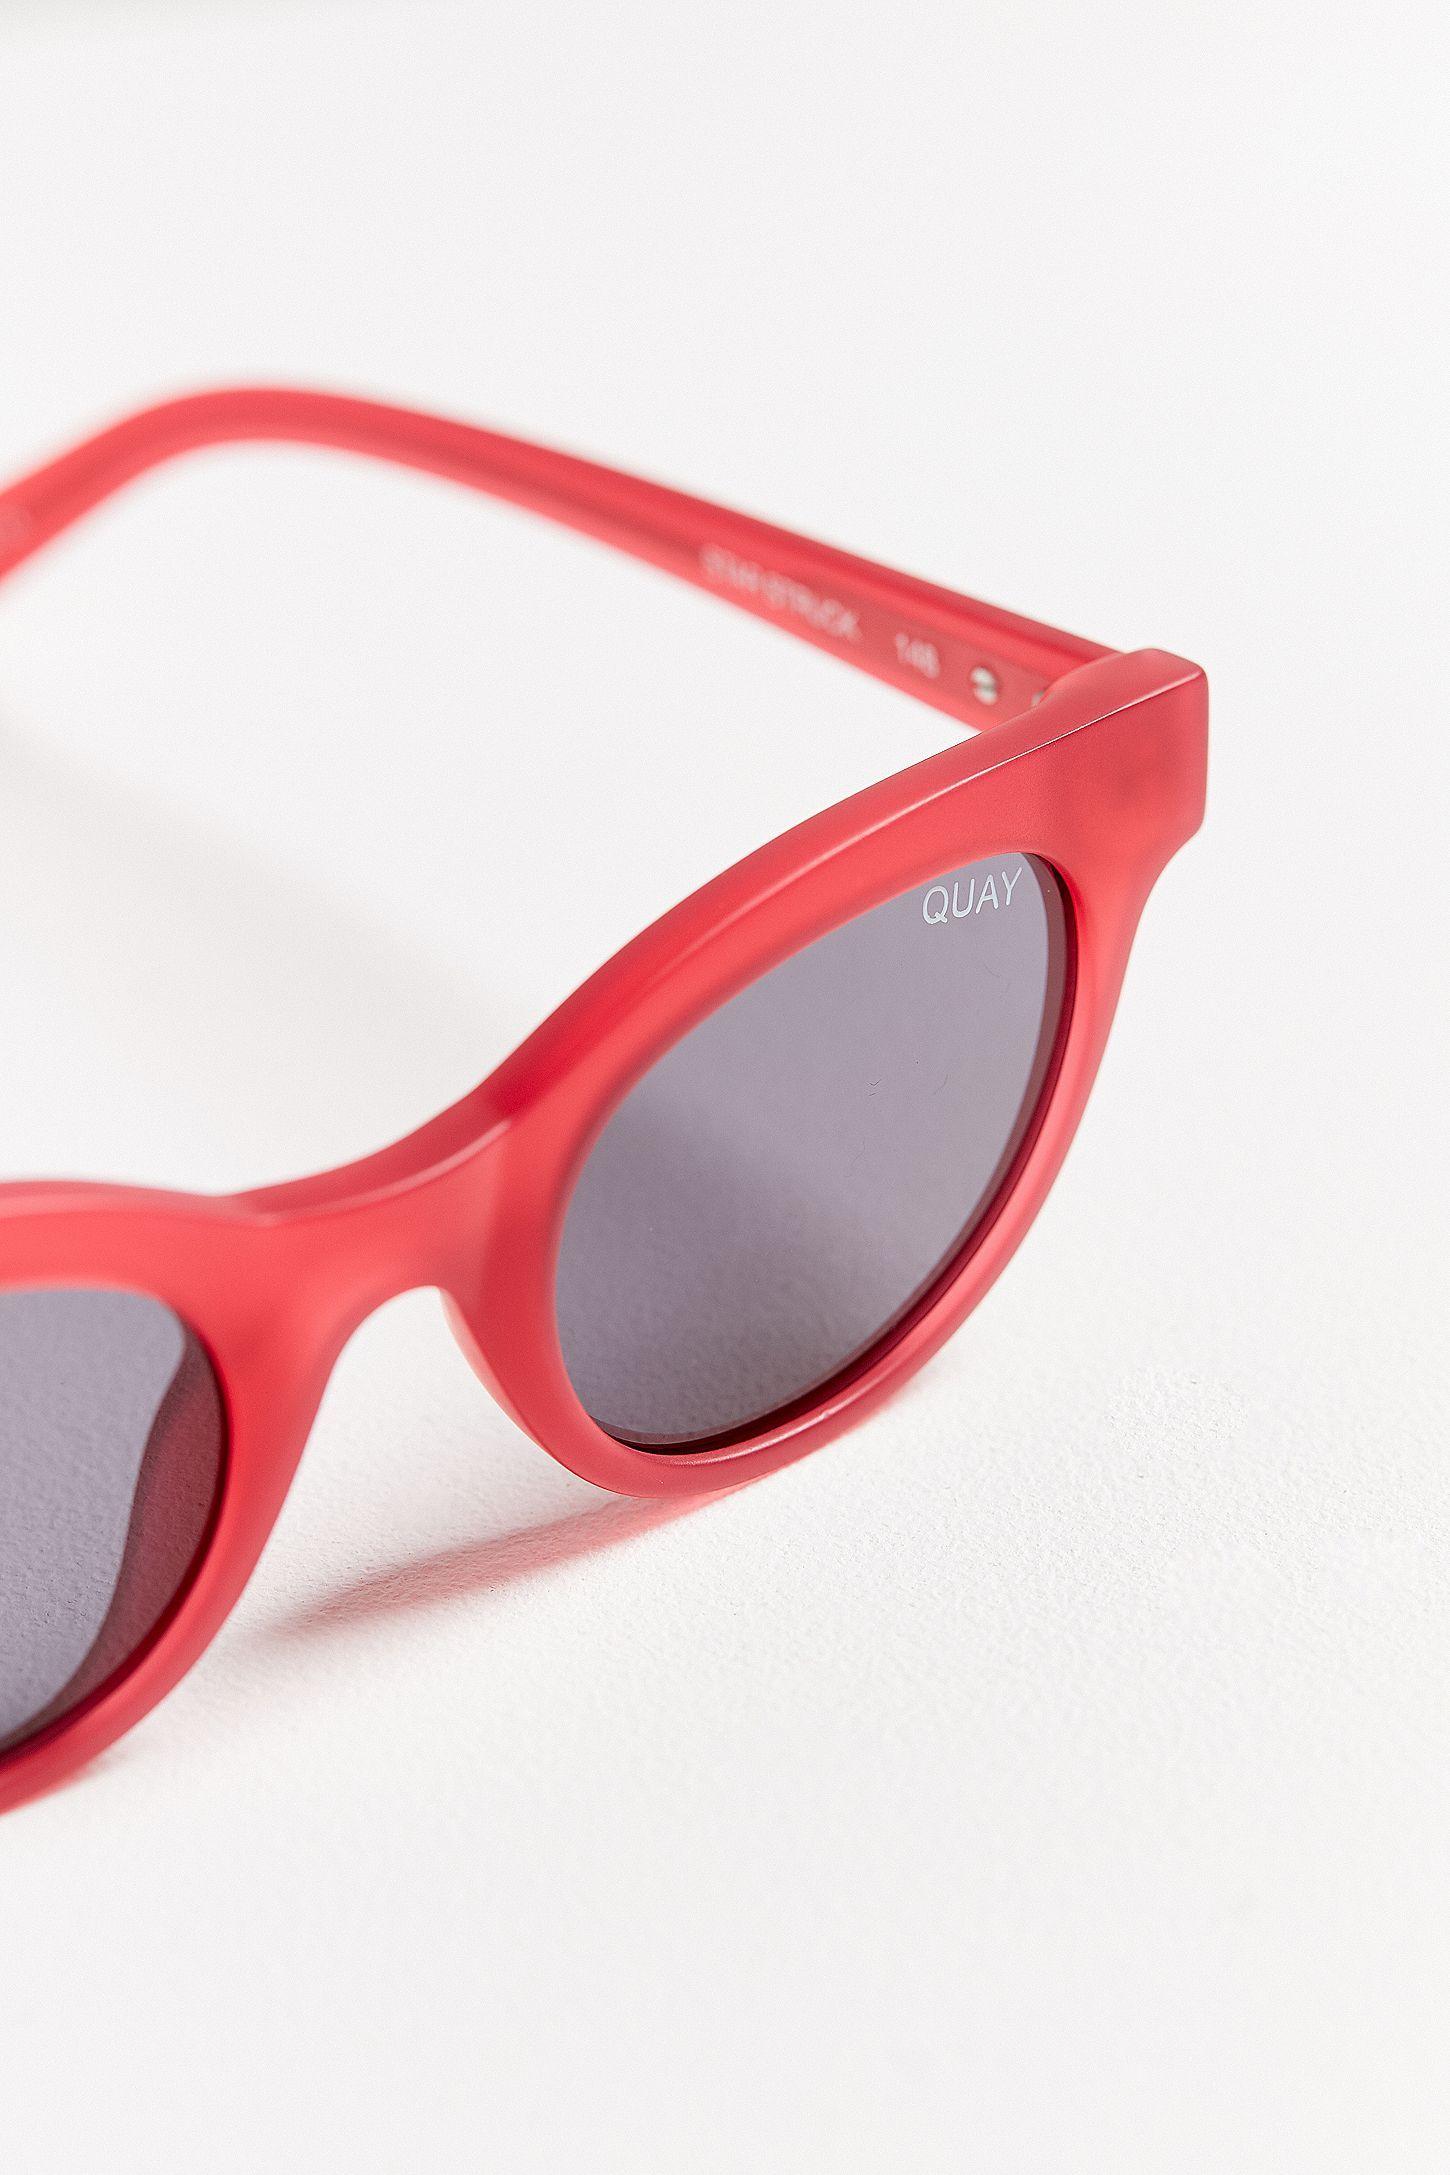 Quay Starstruck Cat Eye Sunglasses Babiators True Blue Classic Ages 3 7